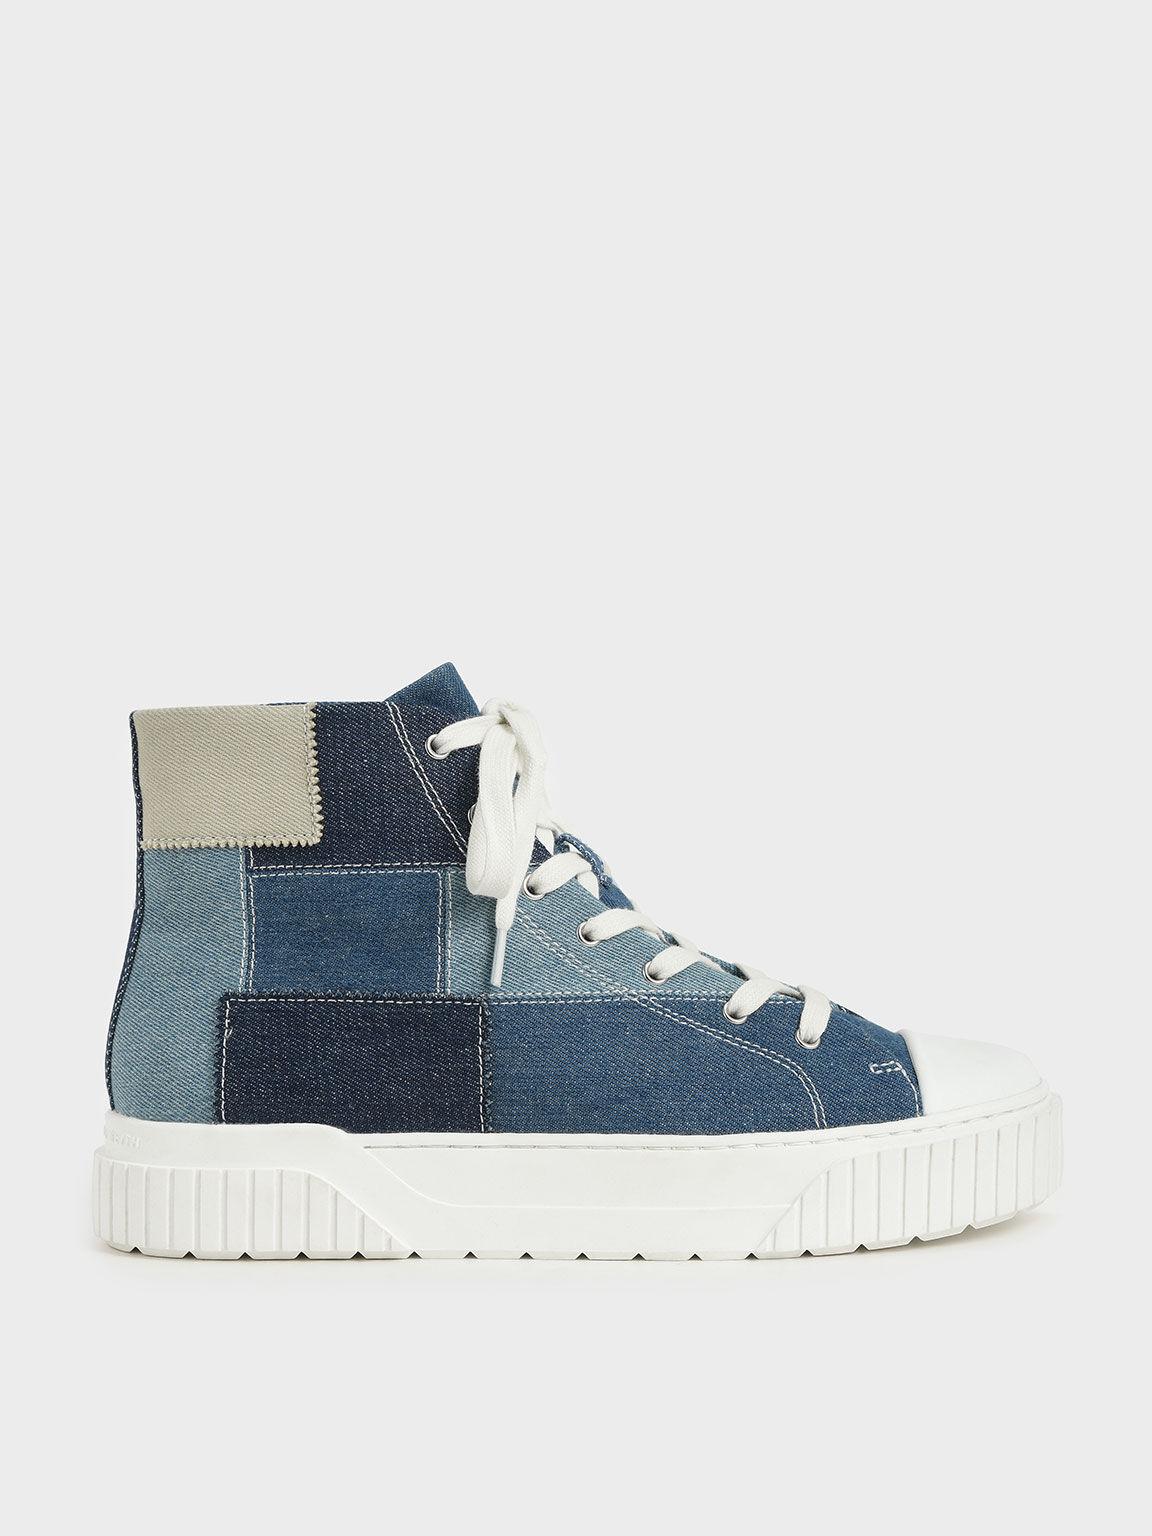 Denim Patchwork High Top Sneakers, Blue, hi-res